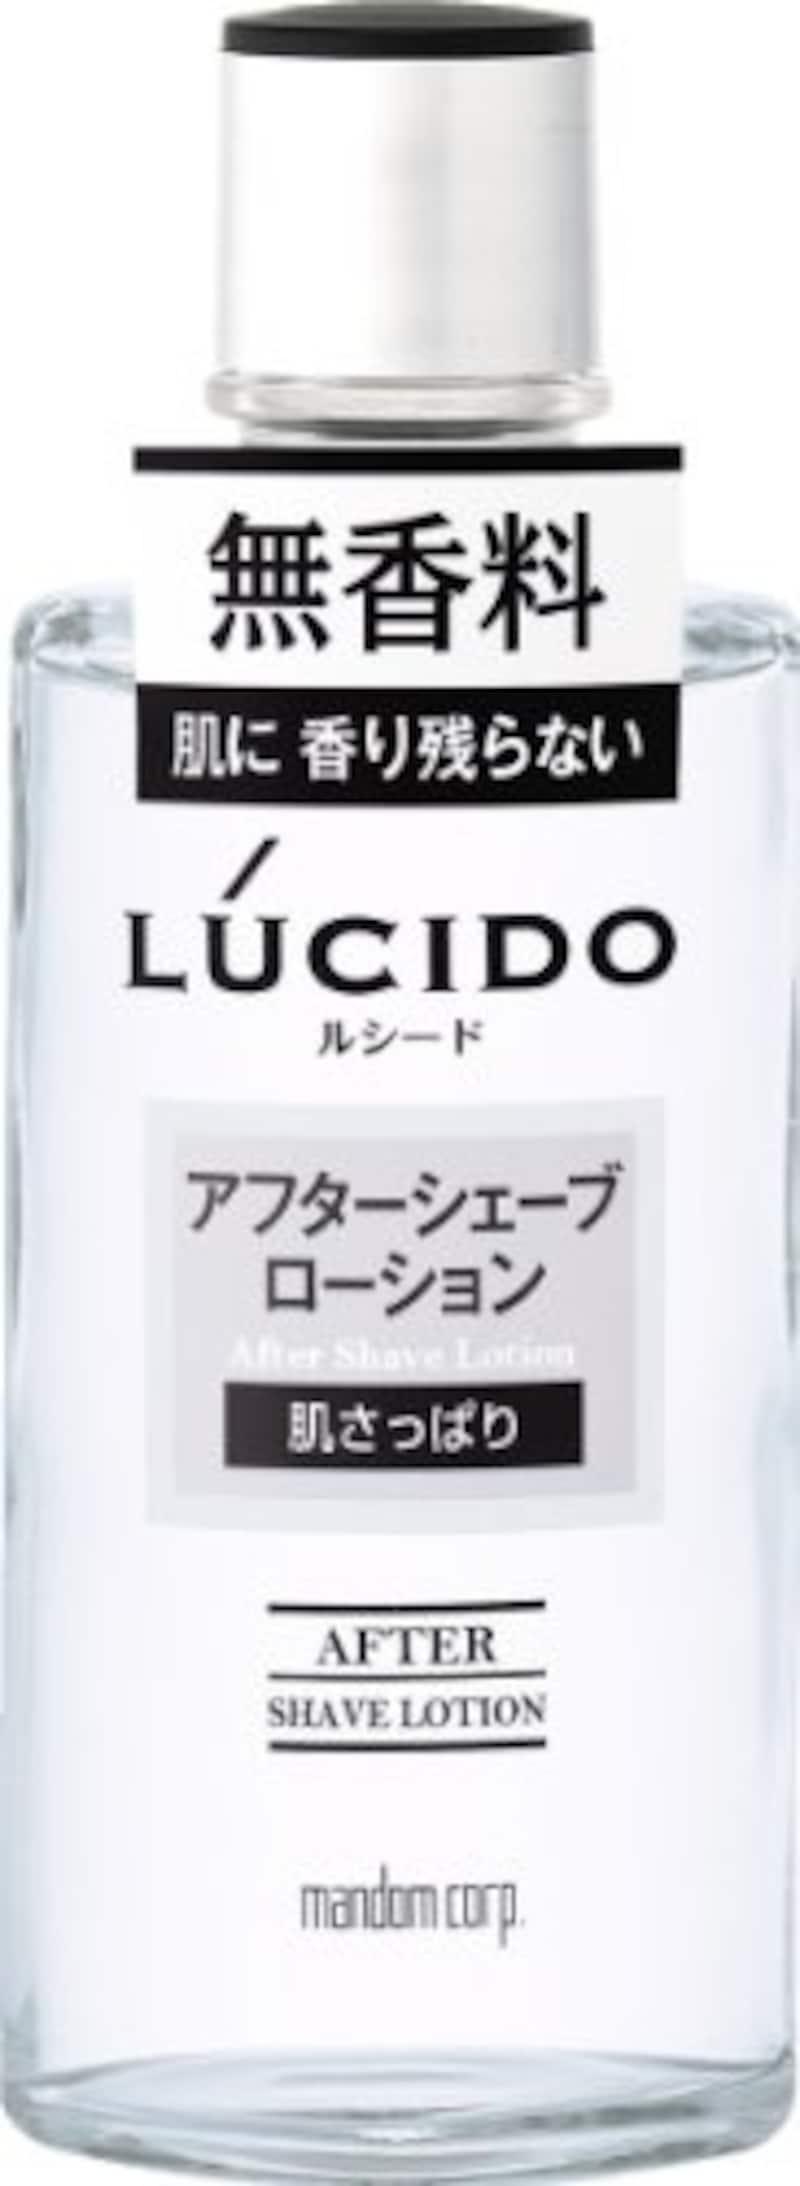 LUCIDO(ルシード),アフターシェーブローション,BU02P03584